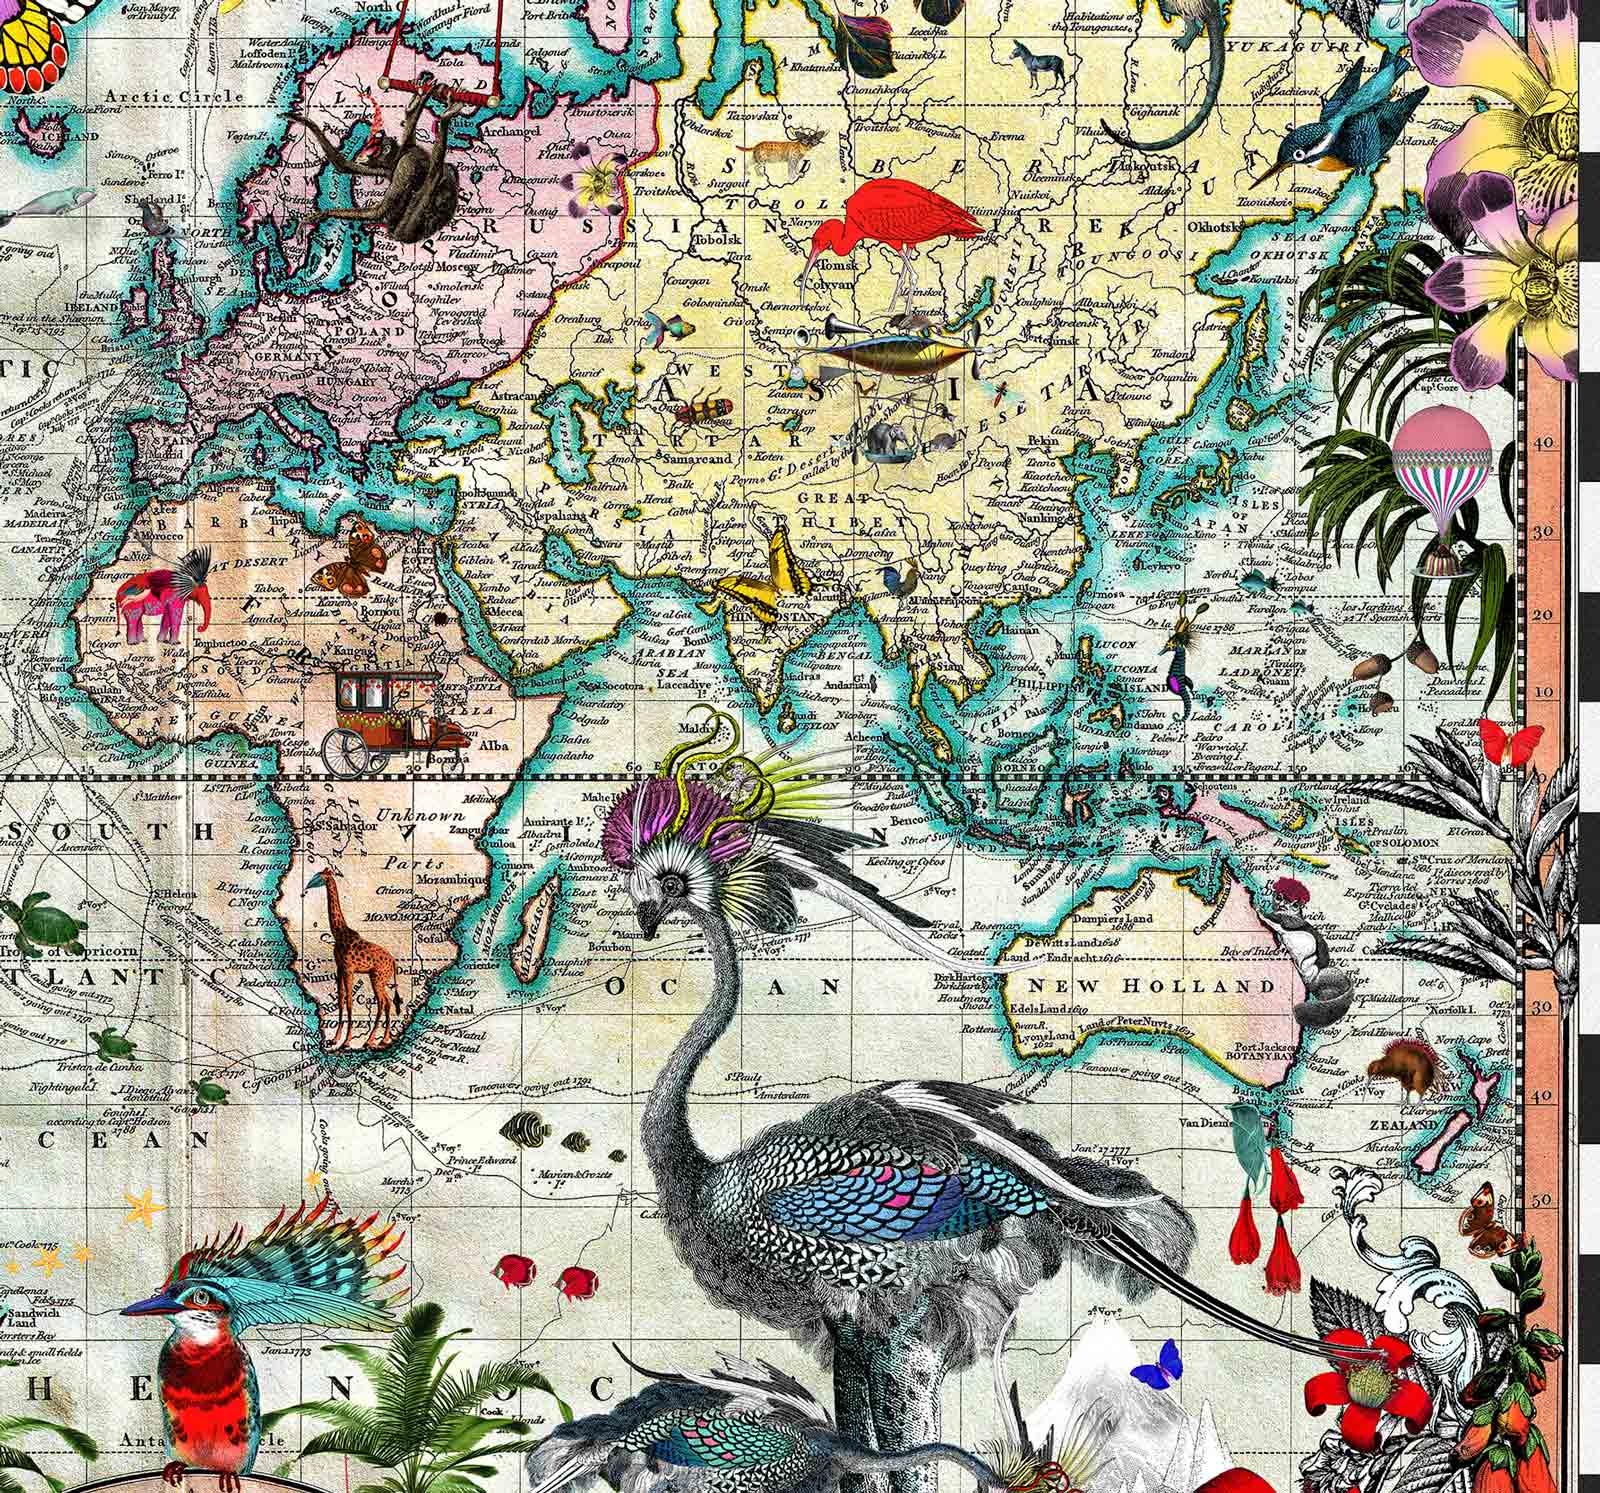 42649_KristjanaWilliams_NavigatorsTracks_d3,